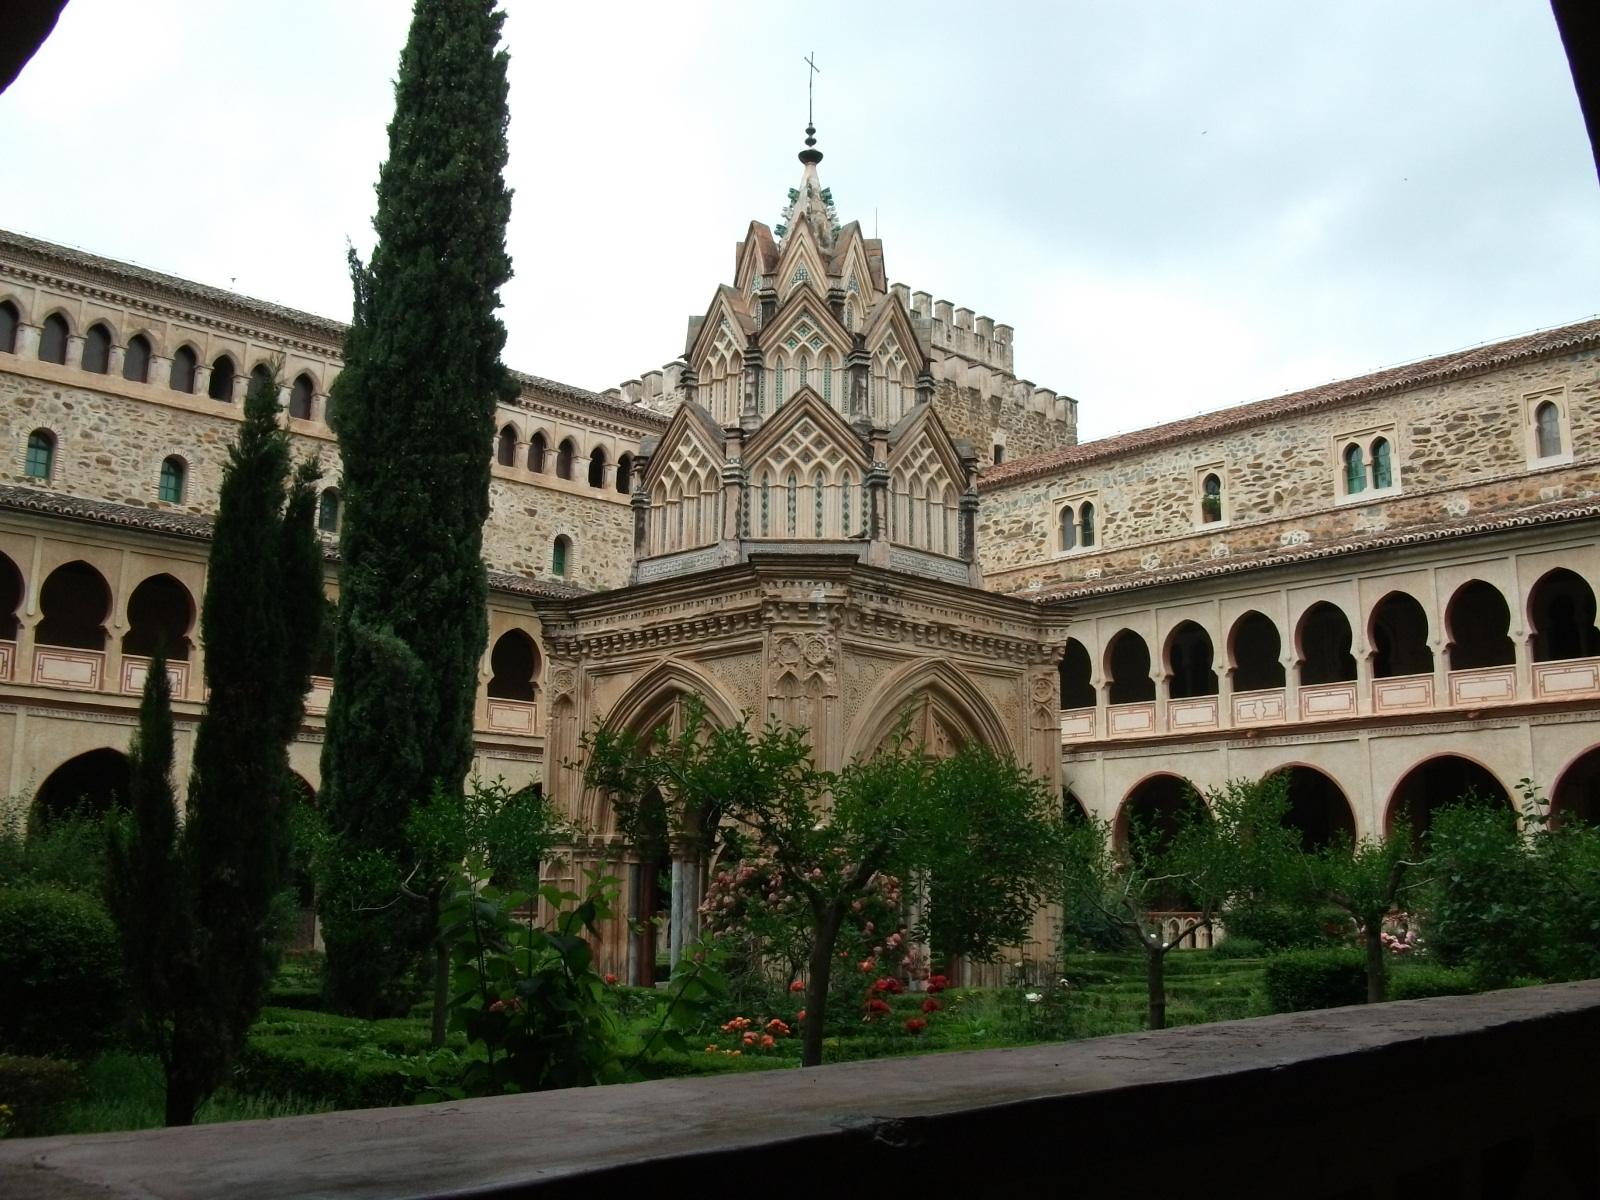 Monasterio de Guadalupe. Cáceres